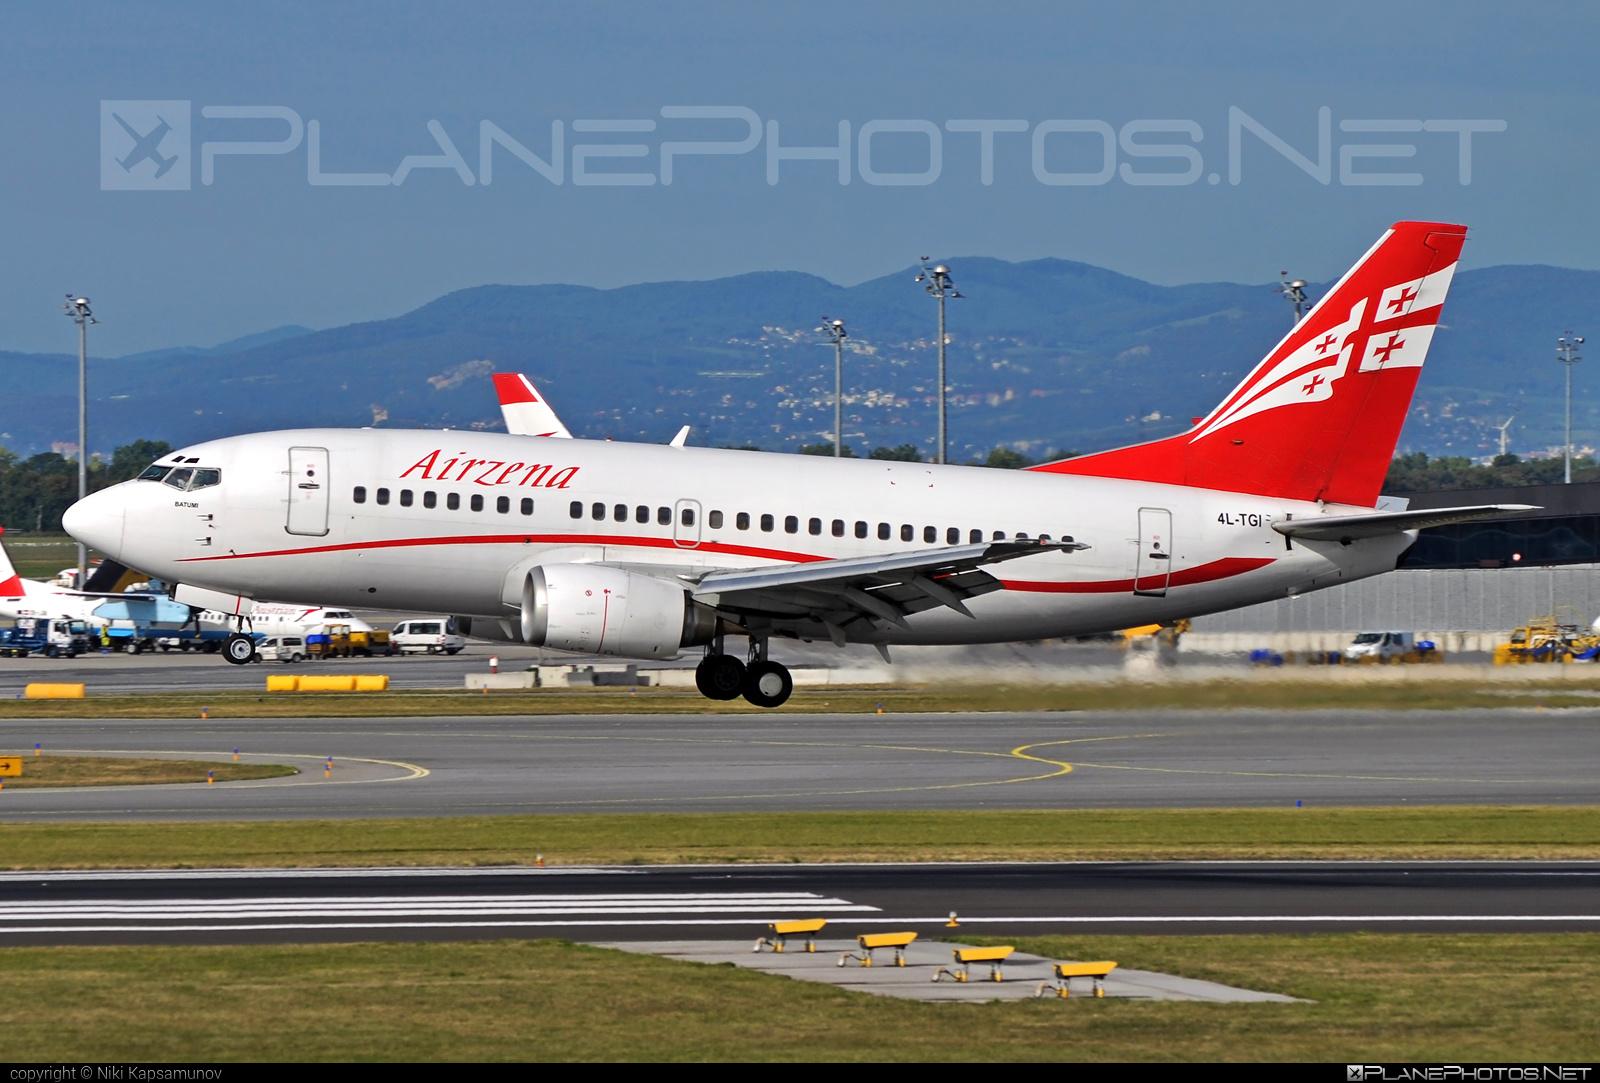 Boeing 737-500 - 4L-TGI operated by Georgian Airways - Airzena #airzena #b737 #boeing #boeing737 #georgianairways